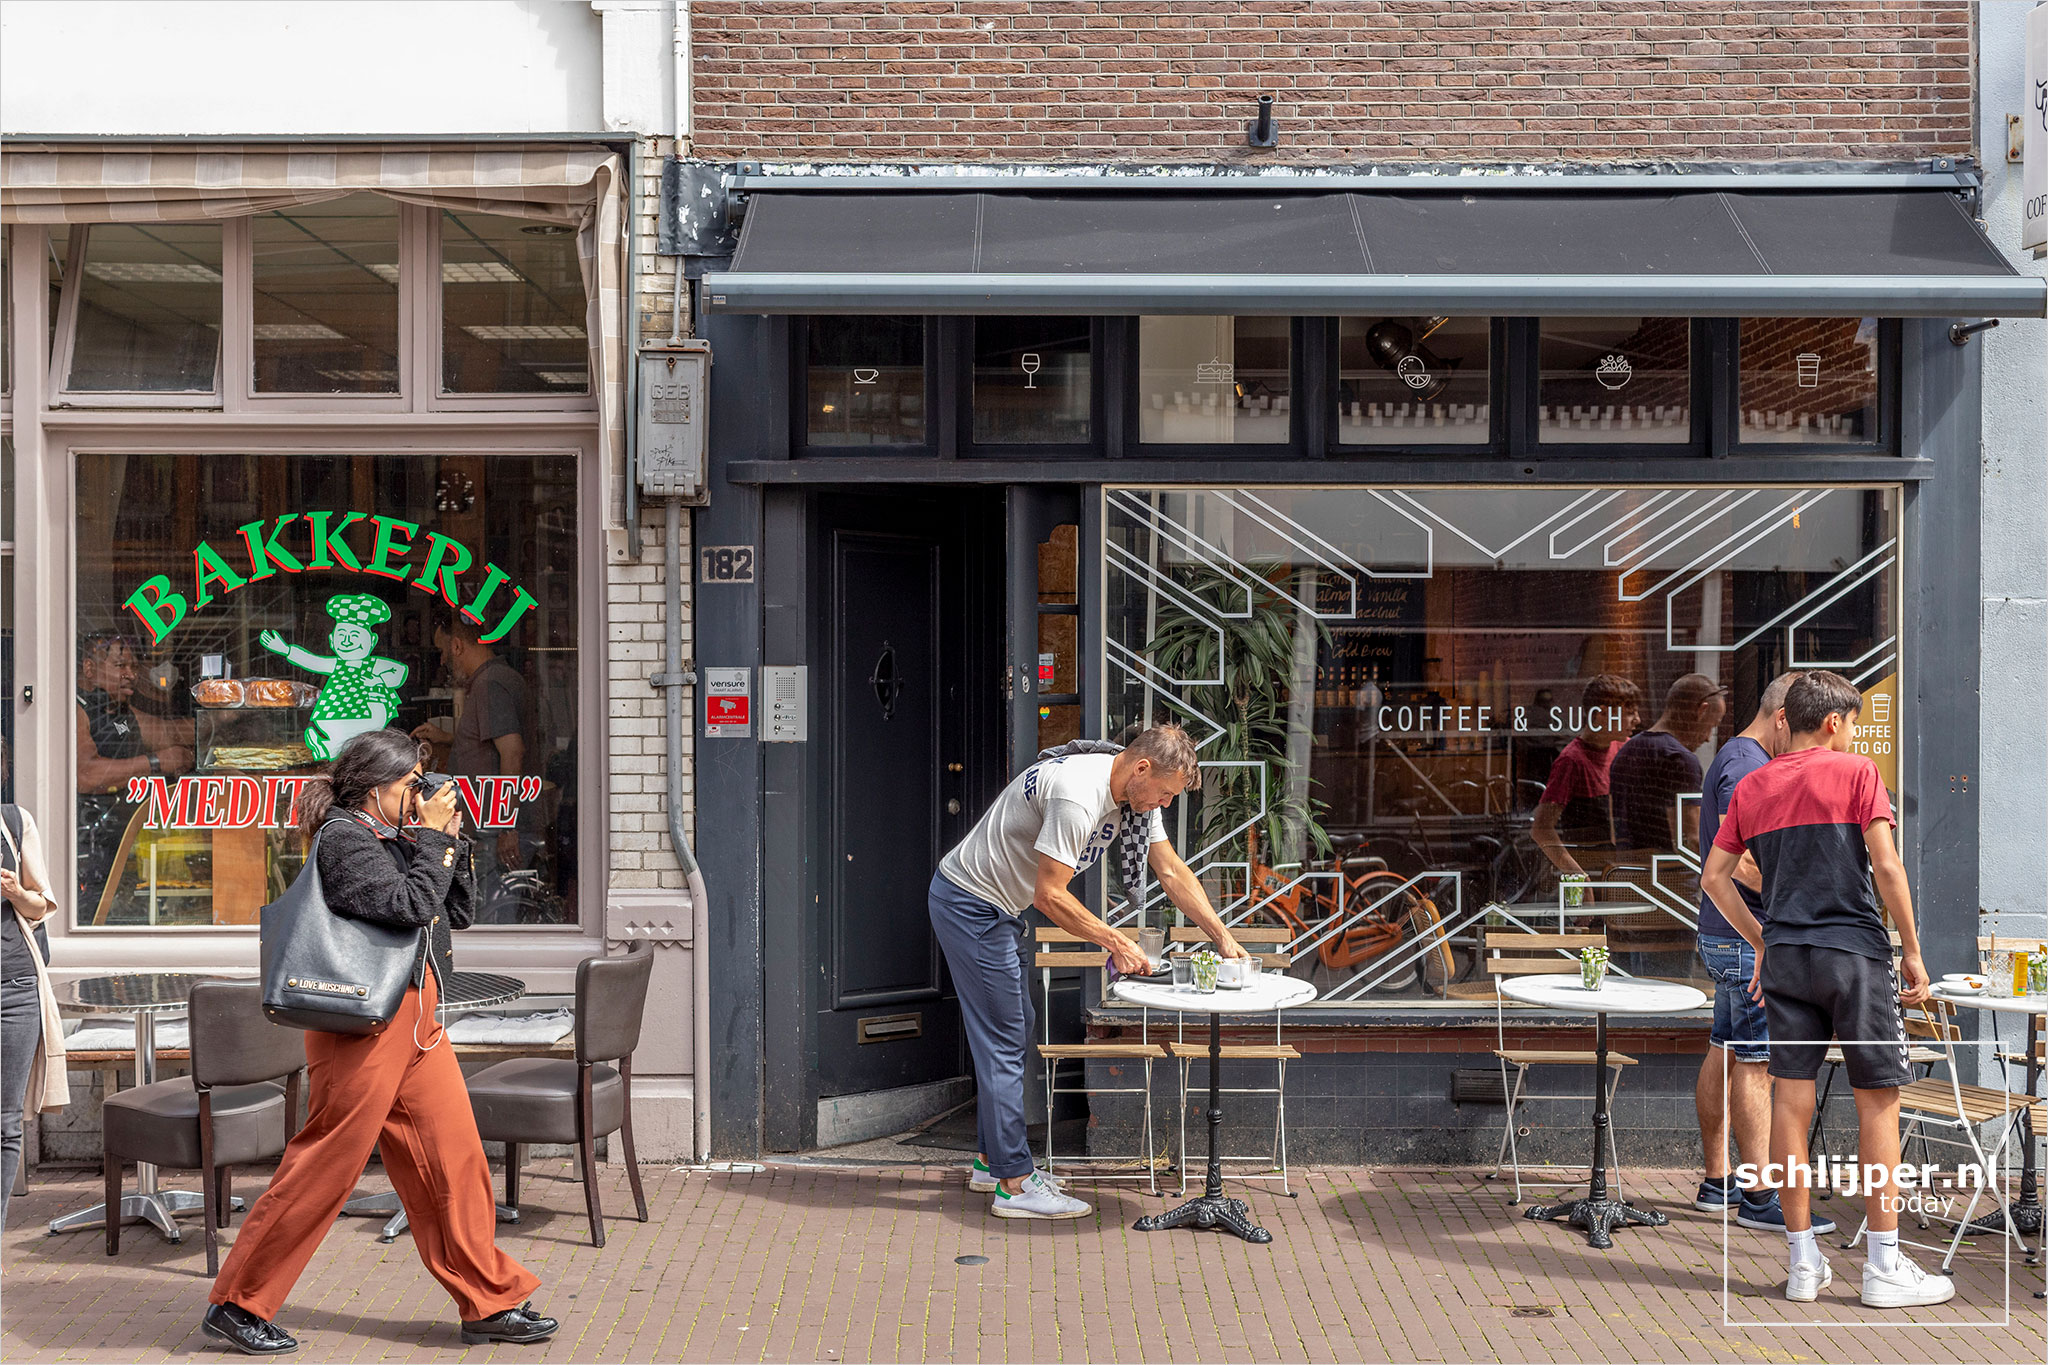 The Netherlands, Amsterdam, 11 augustus 2021